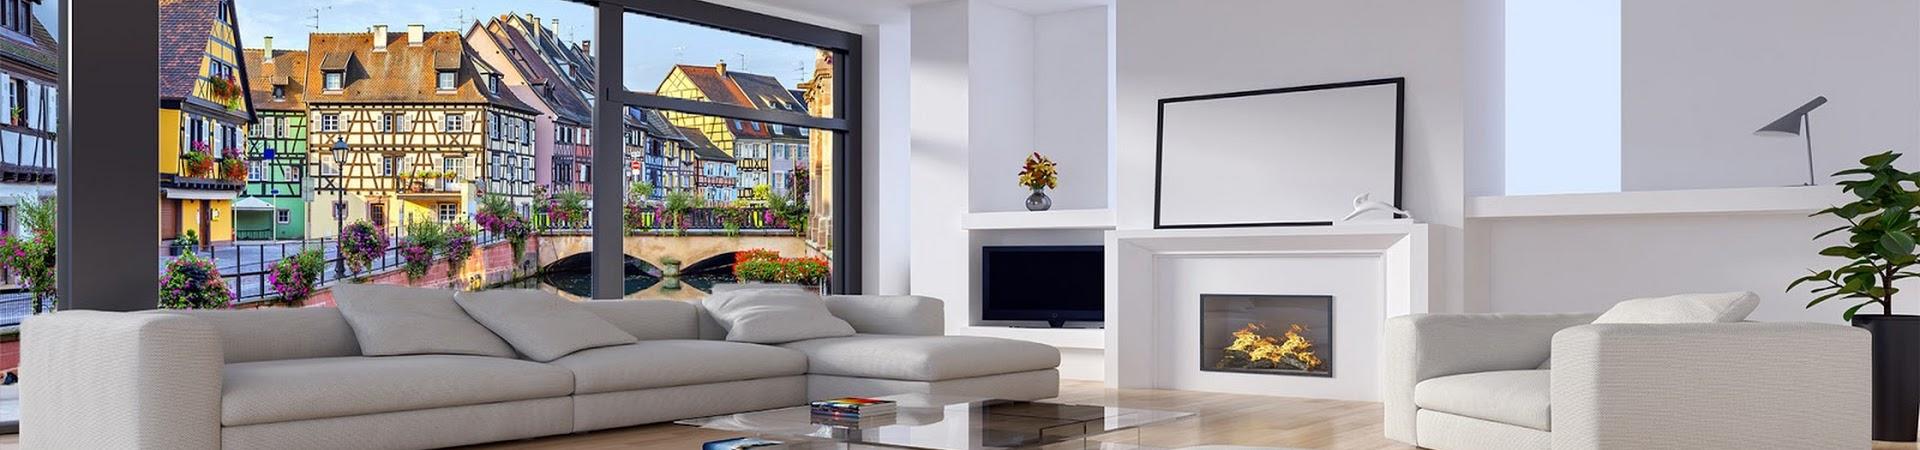 Immobilier Riedisheim